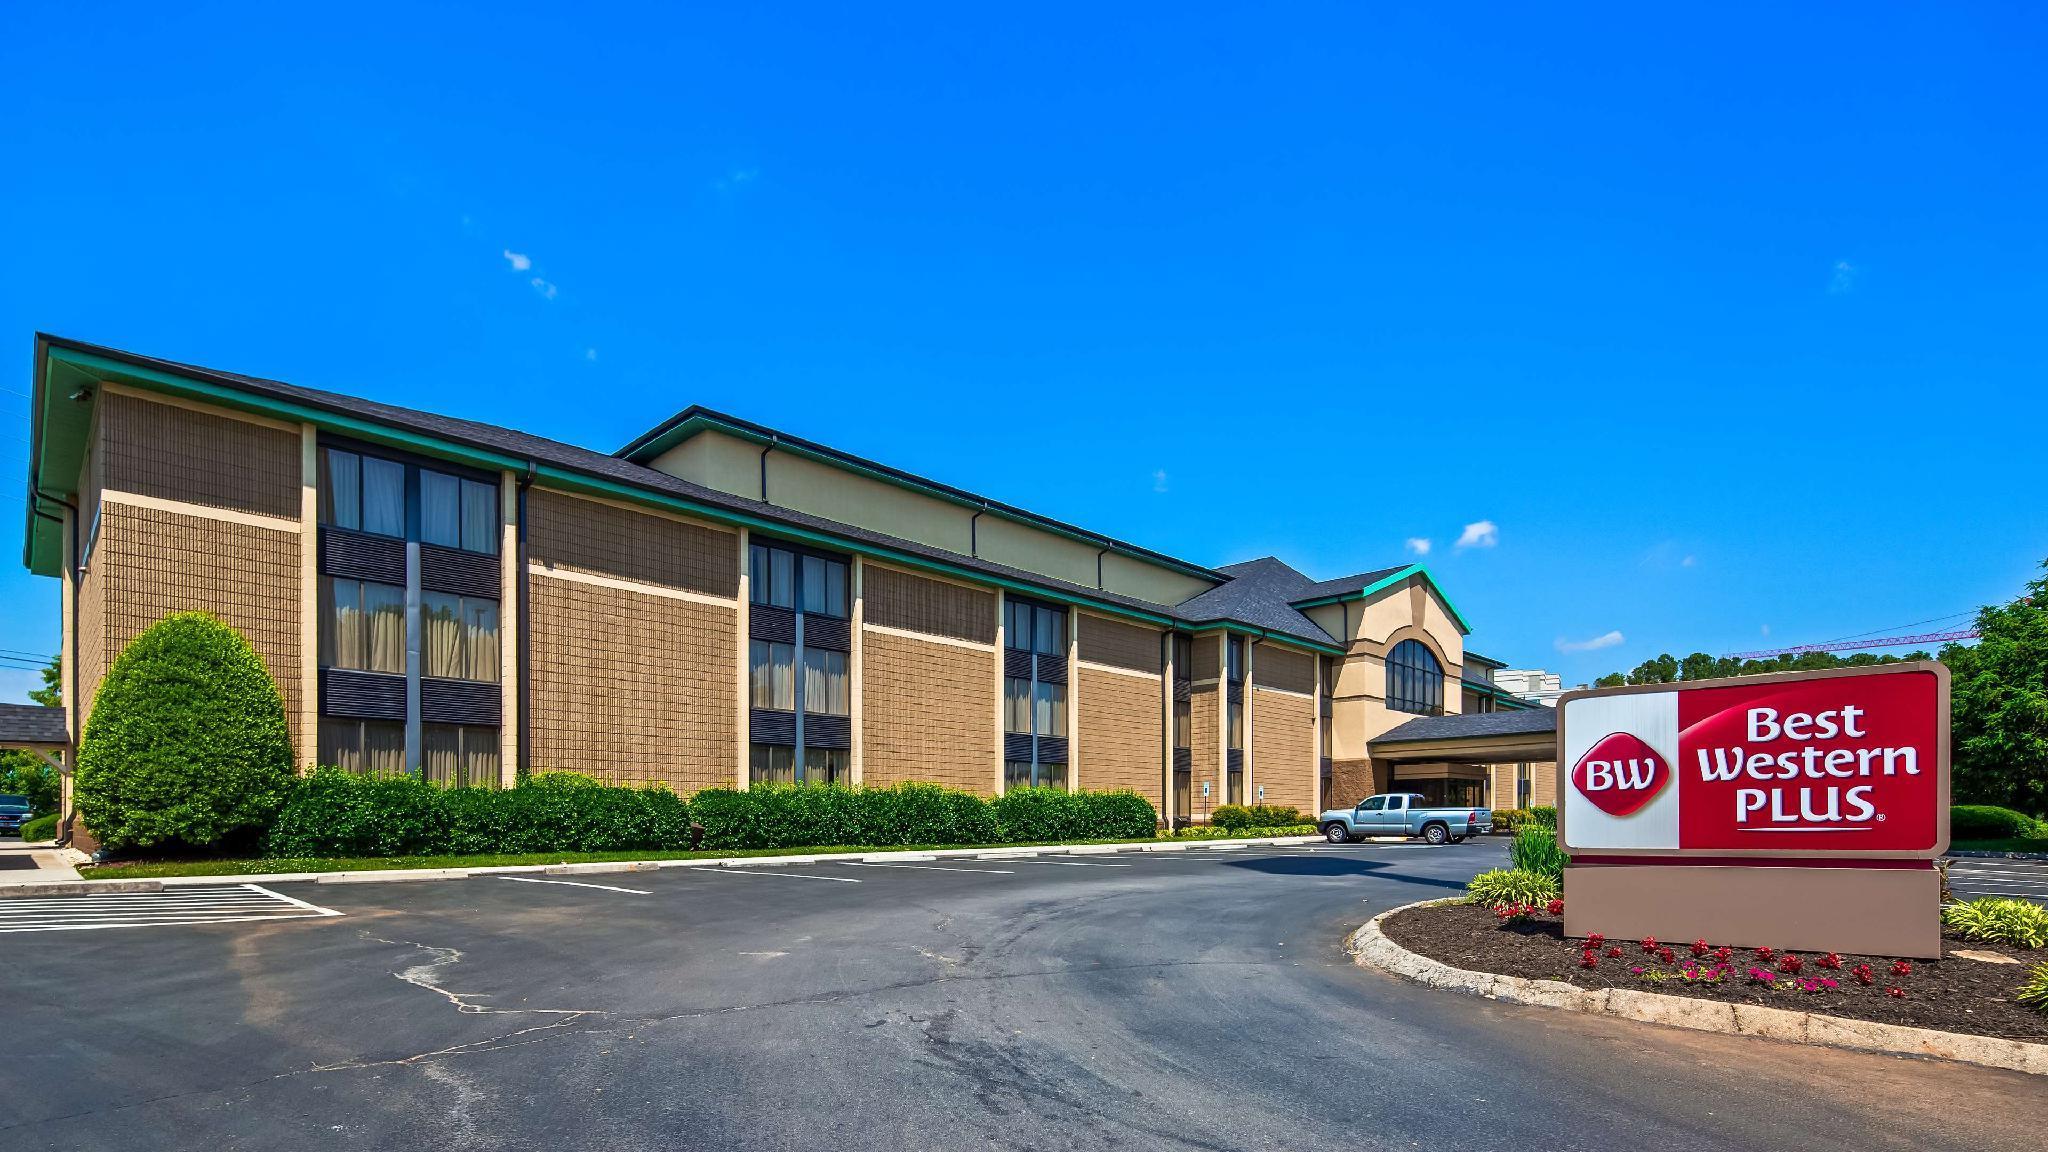 Best Western PLUS Cedar Bluff Inn image